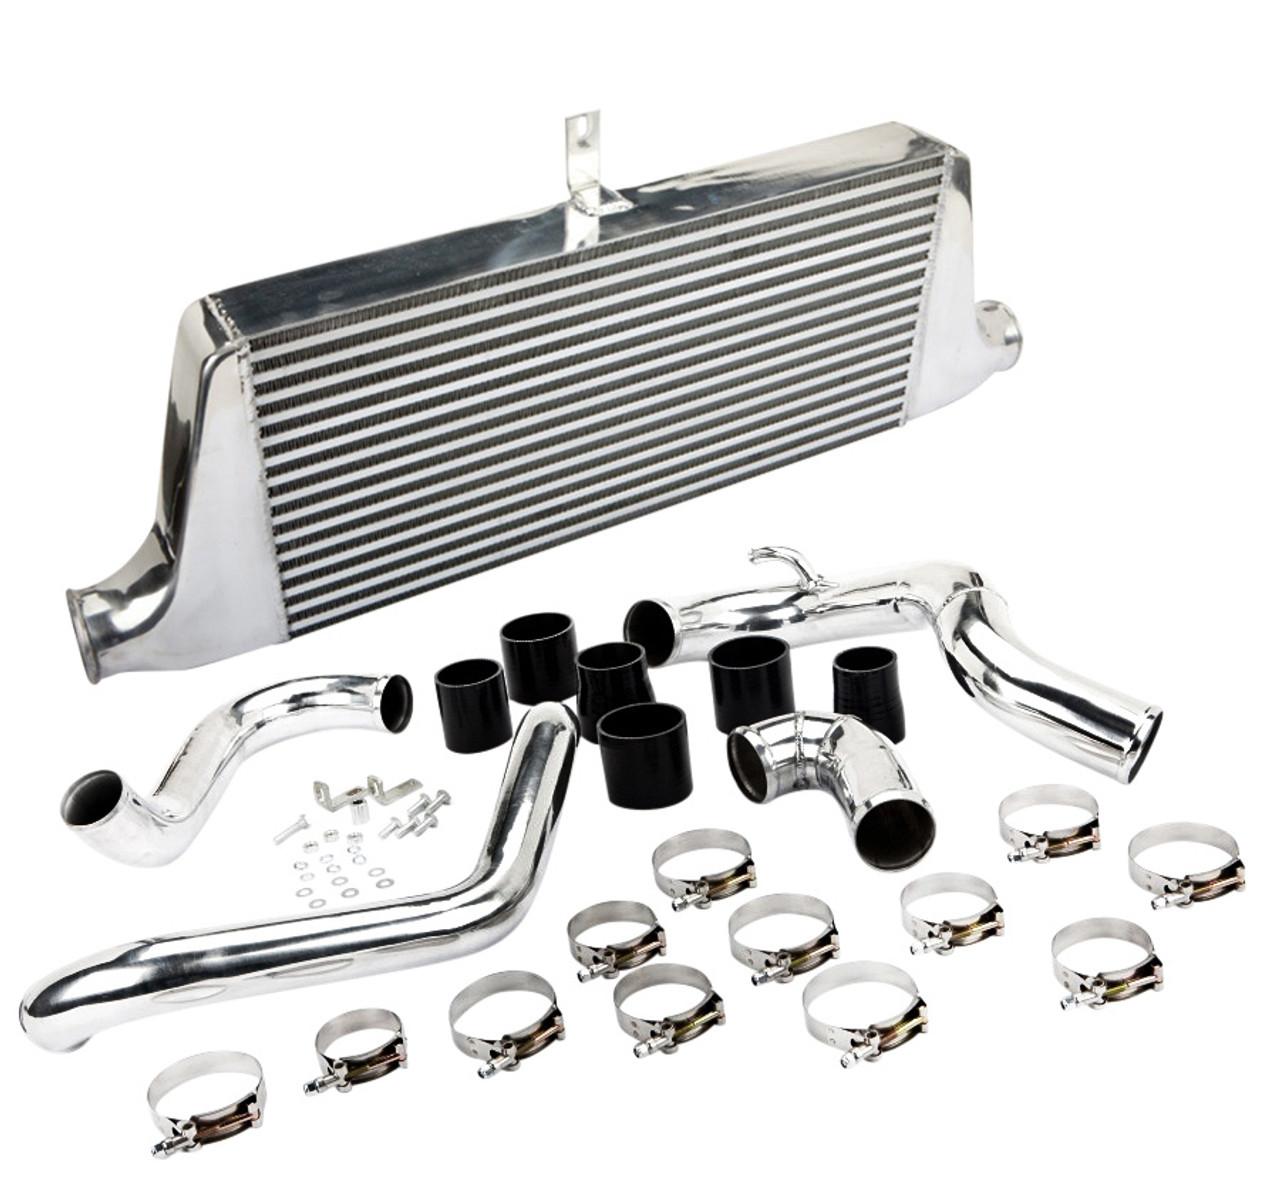 isr performance m spec front mount intercooler kit nissan 240sx Nissan Body Harness isr performance m spec front mount intercooler kit nissan 240sx ka24de enjuku racing parts, llc